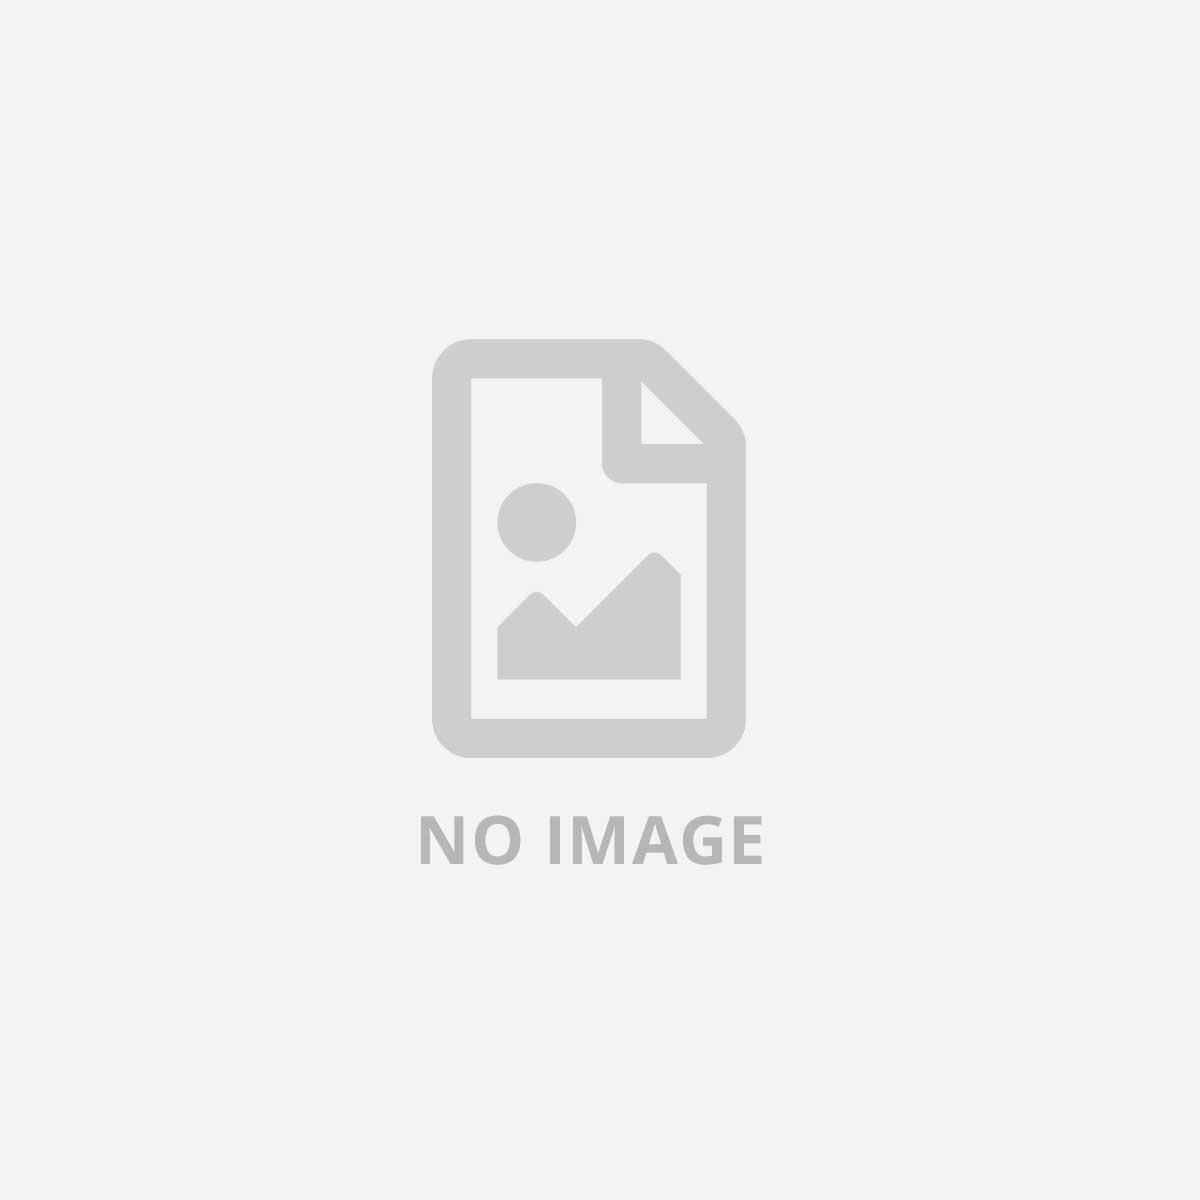 HPE ML30 GEN10 E-2224 1P 16G 4LFF